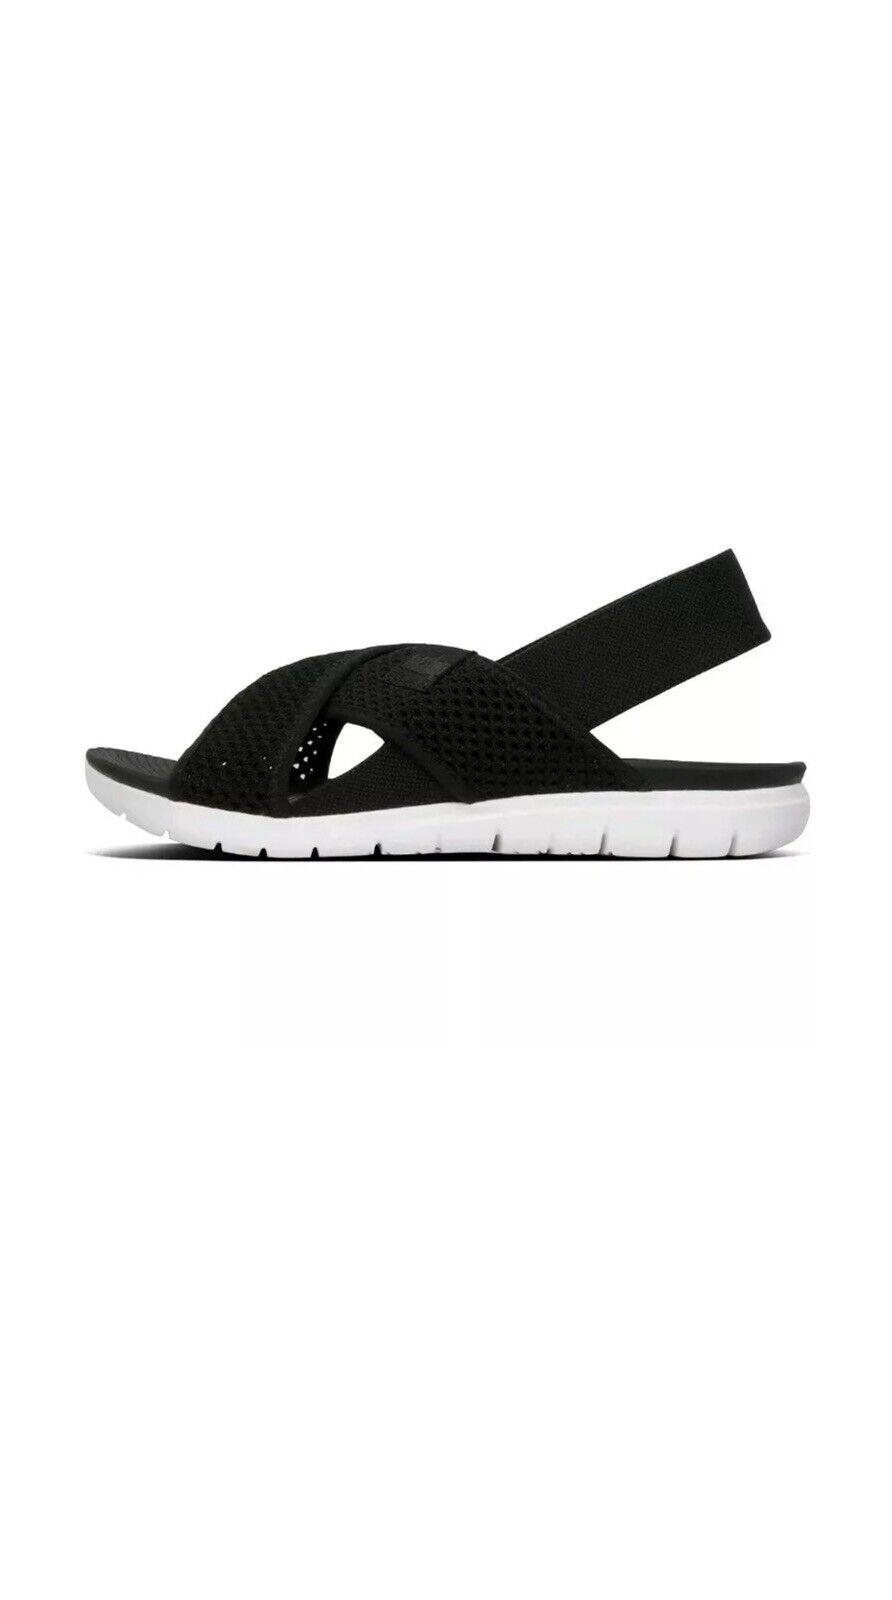 FitFlop Airmesh Women Slingback Sandals